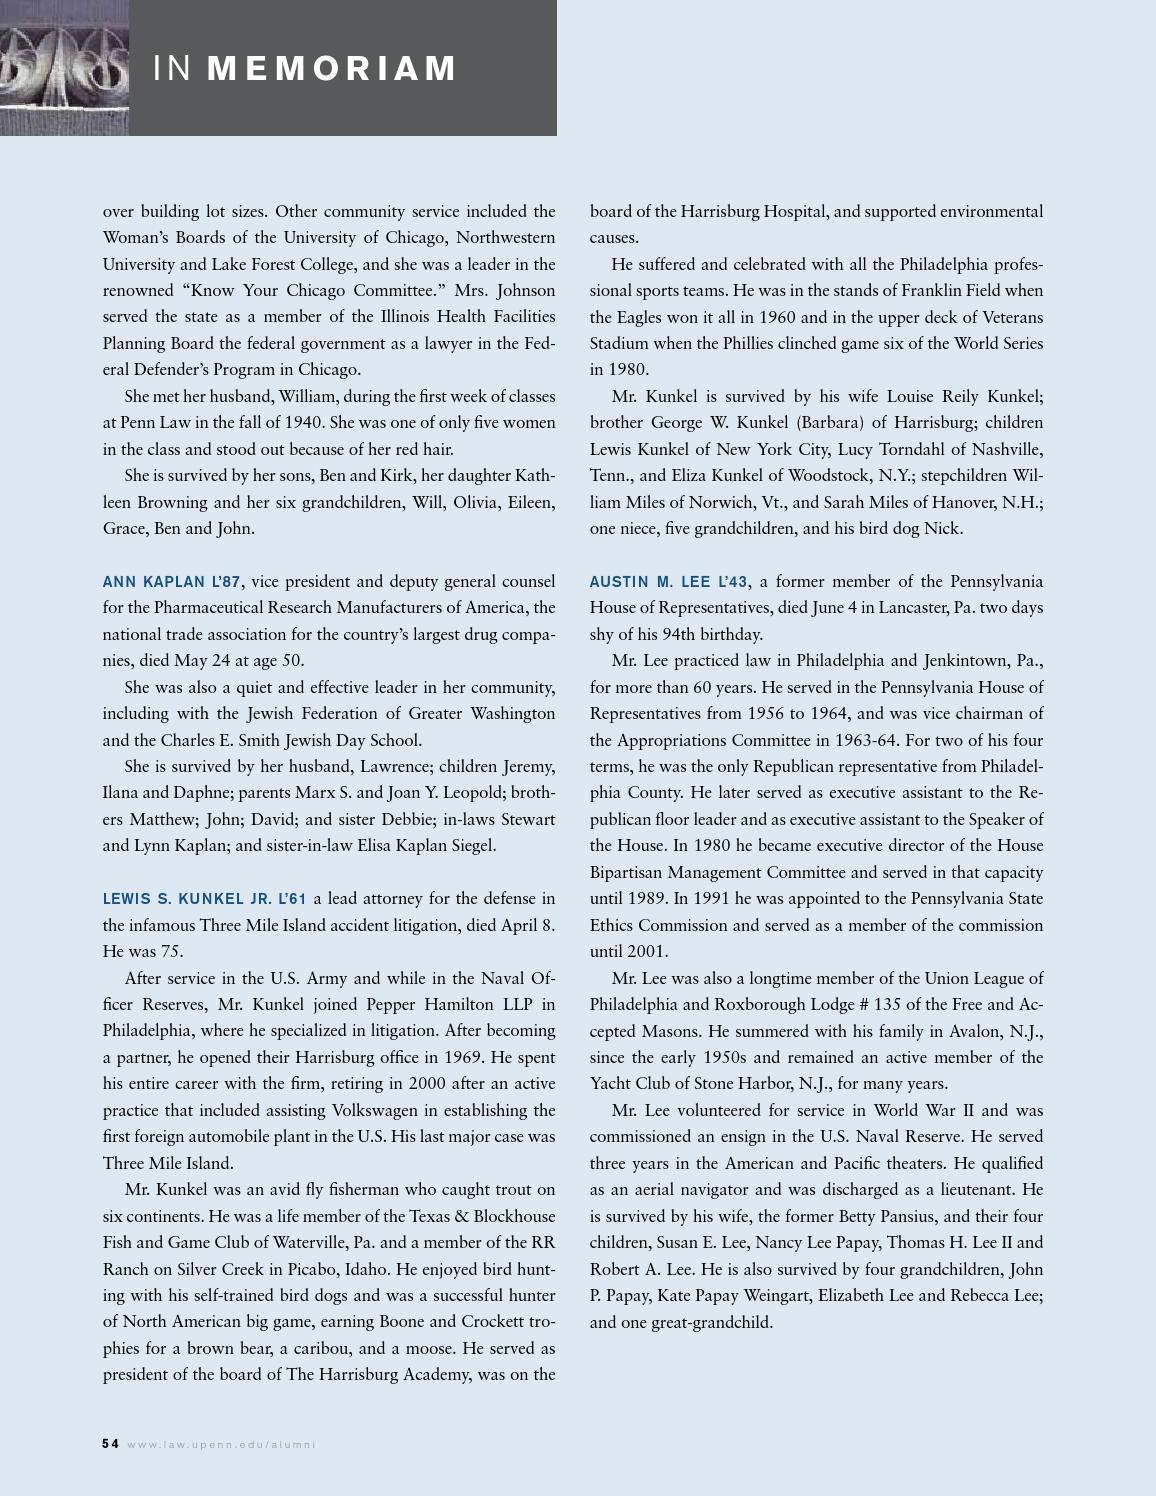 Penn law admissions essay